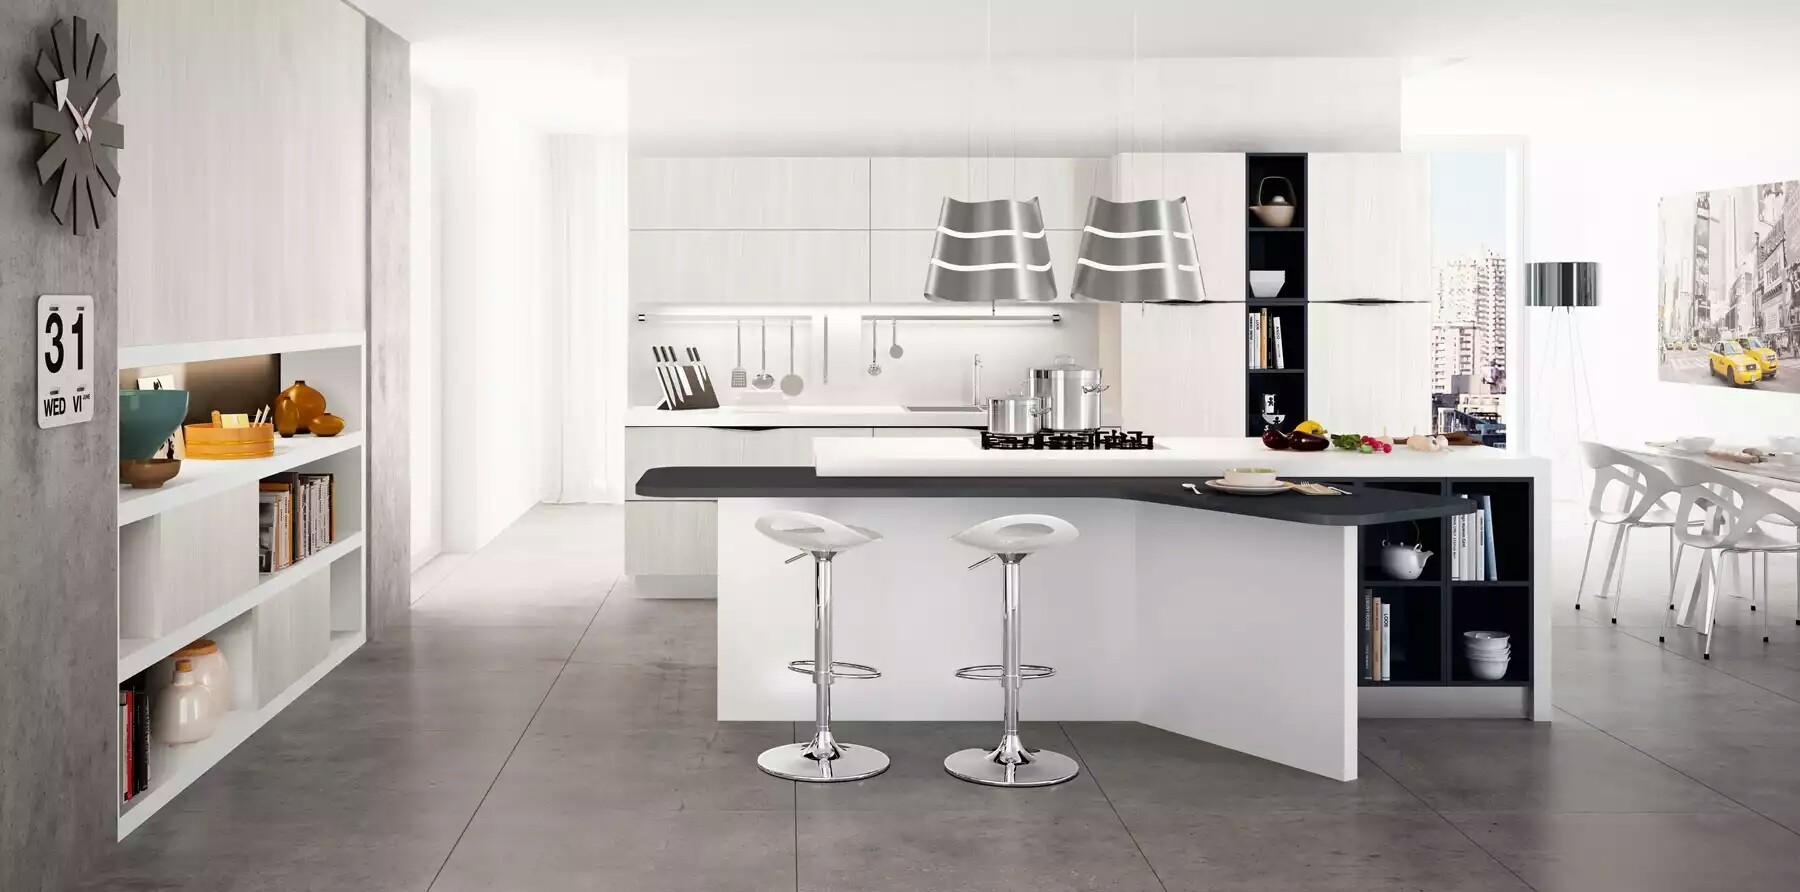 Bright and Sunny Kitchen Design ideas | My Decorative